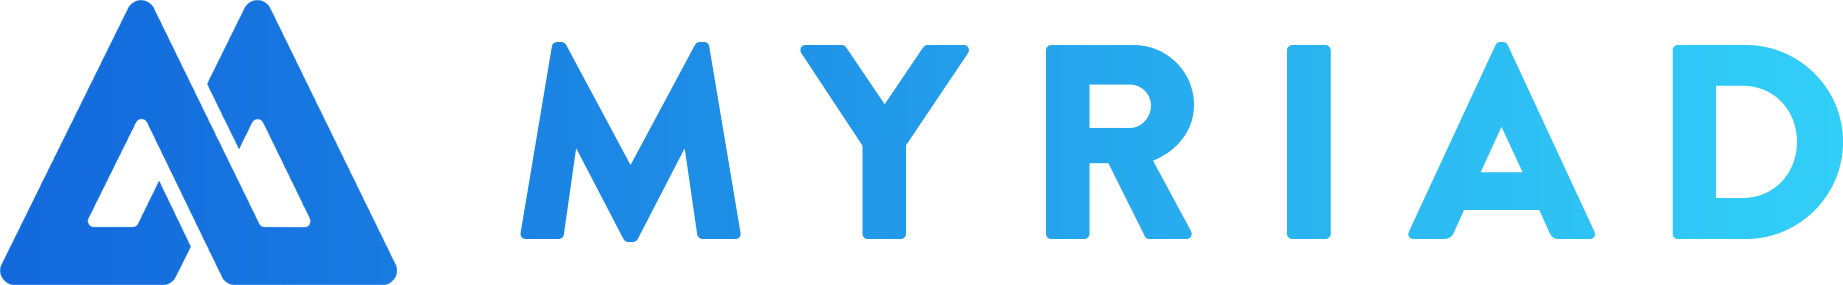 Myriad Case Logo (Horizontal)